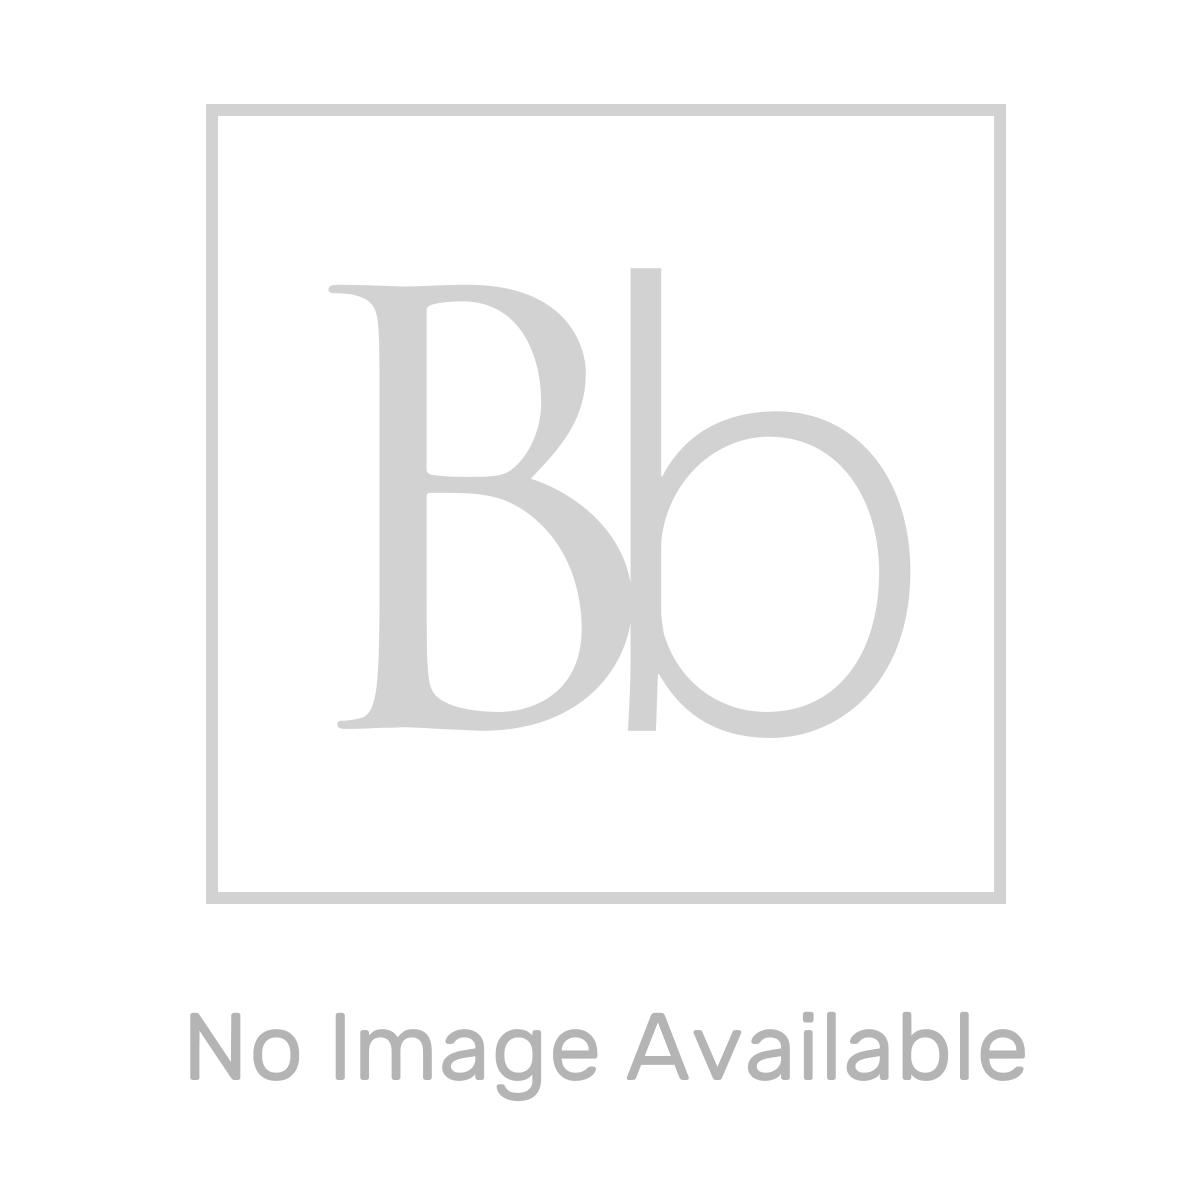 Como led mirror Infrared sensor switch